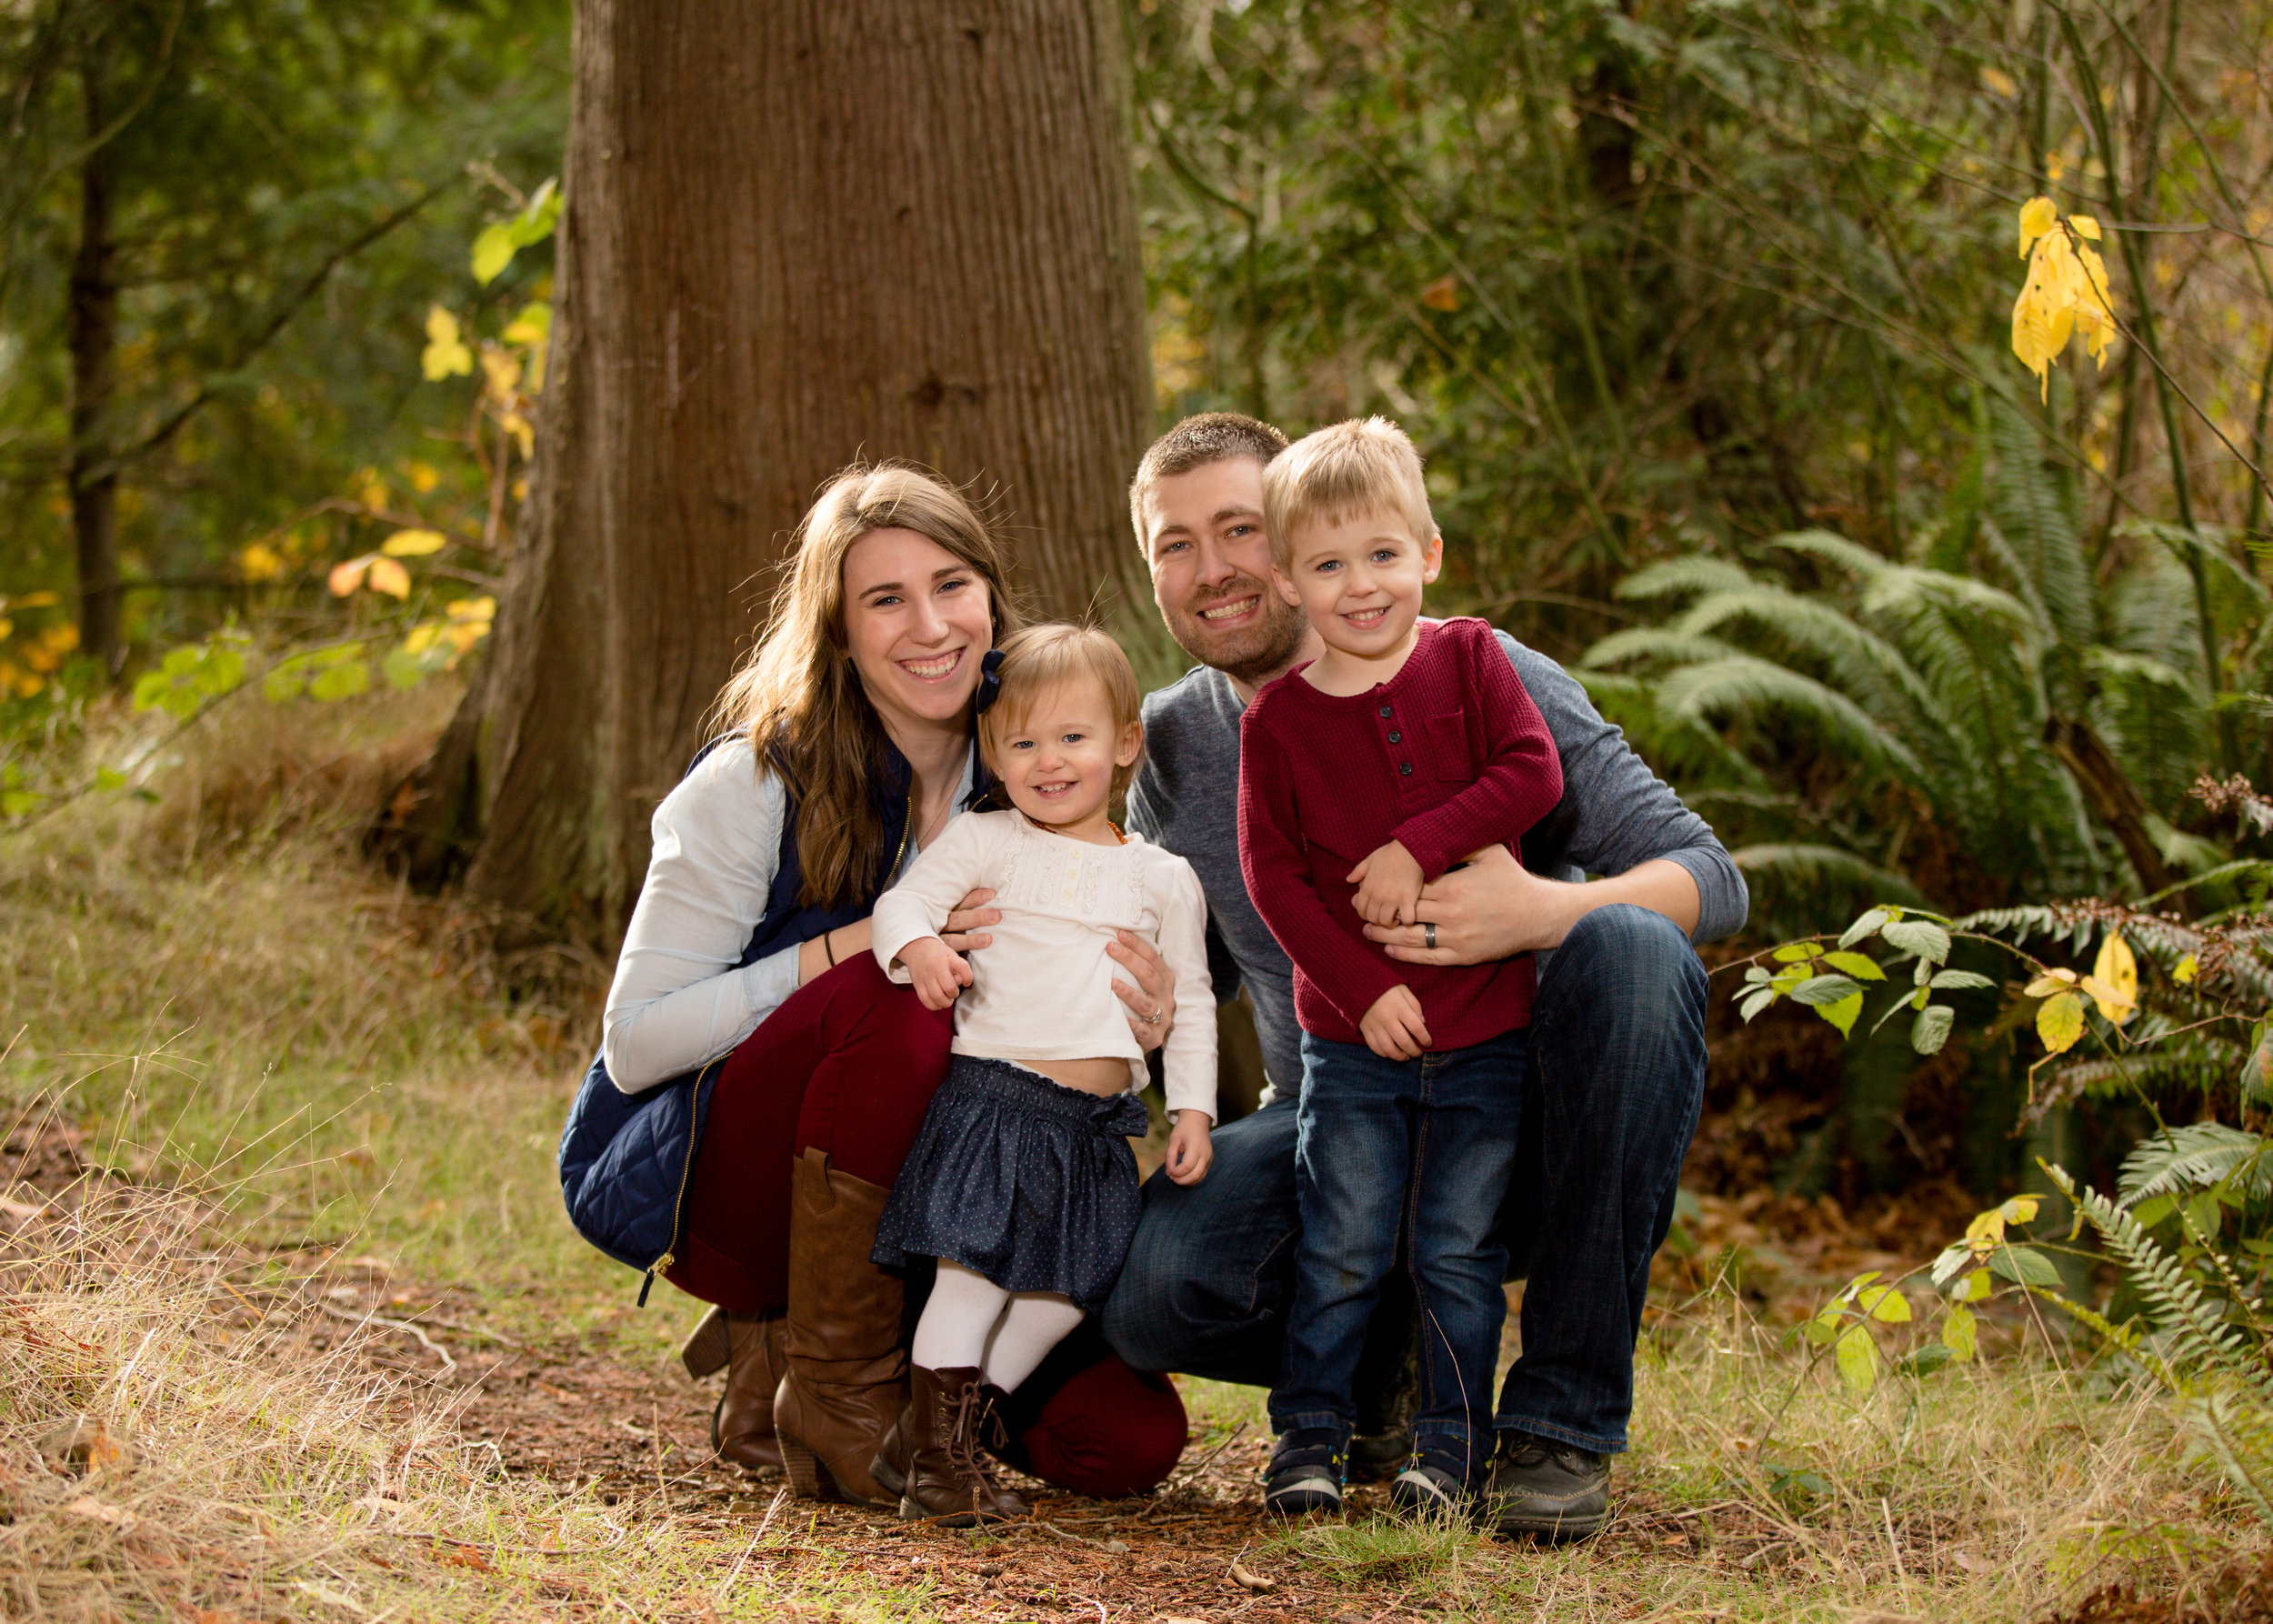 Snohomish County Family Photographer | Lake Stevens WA